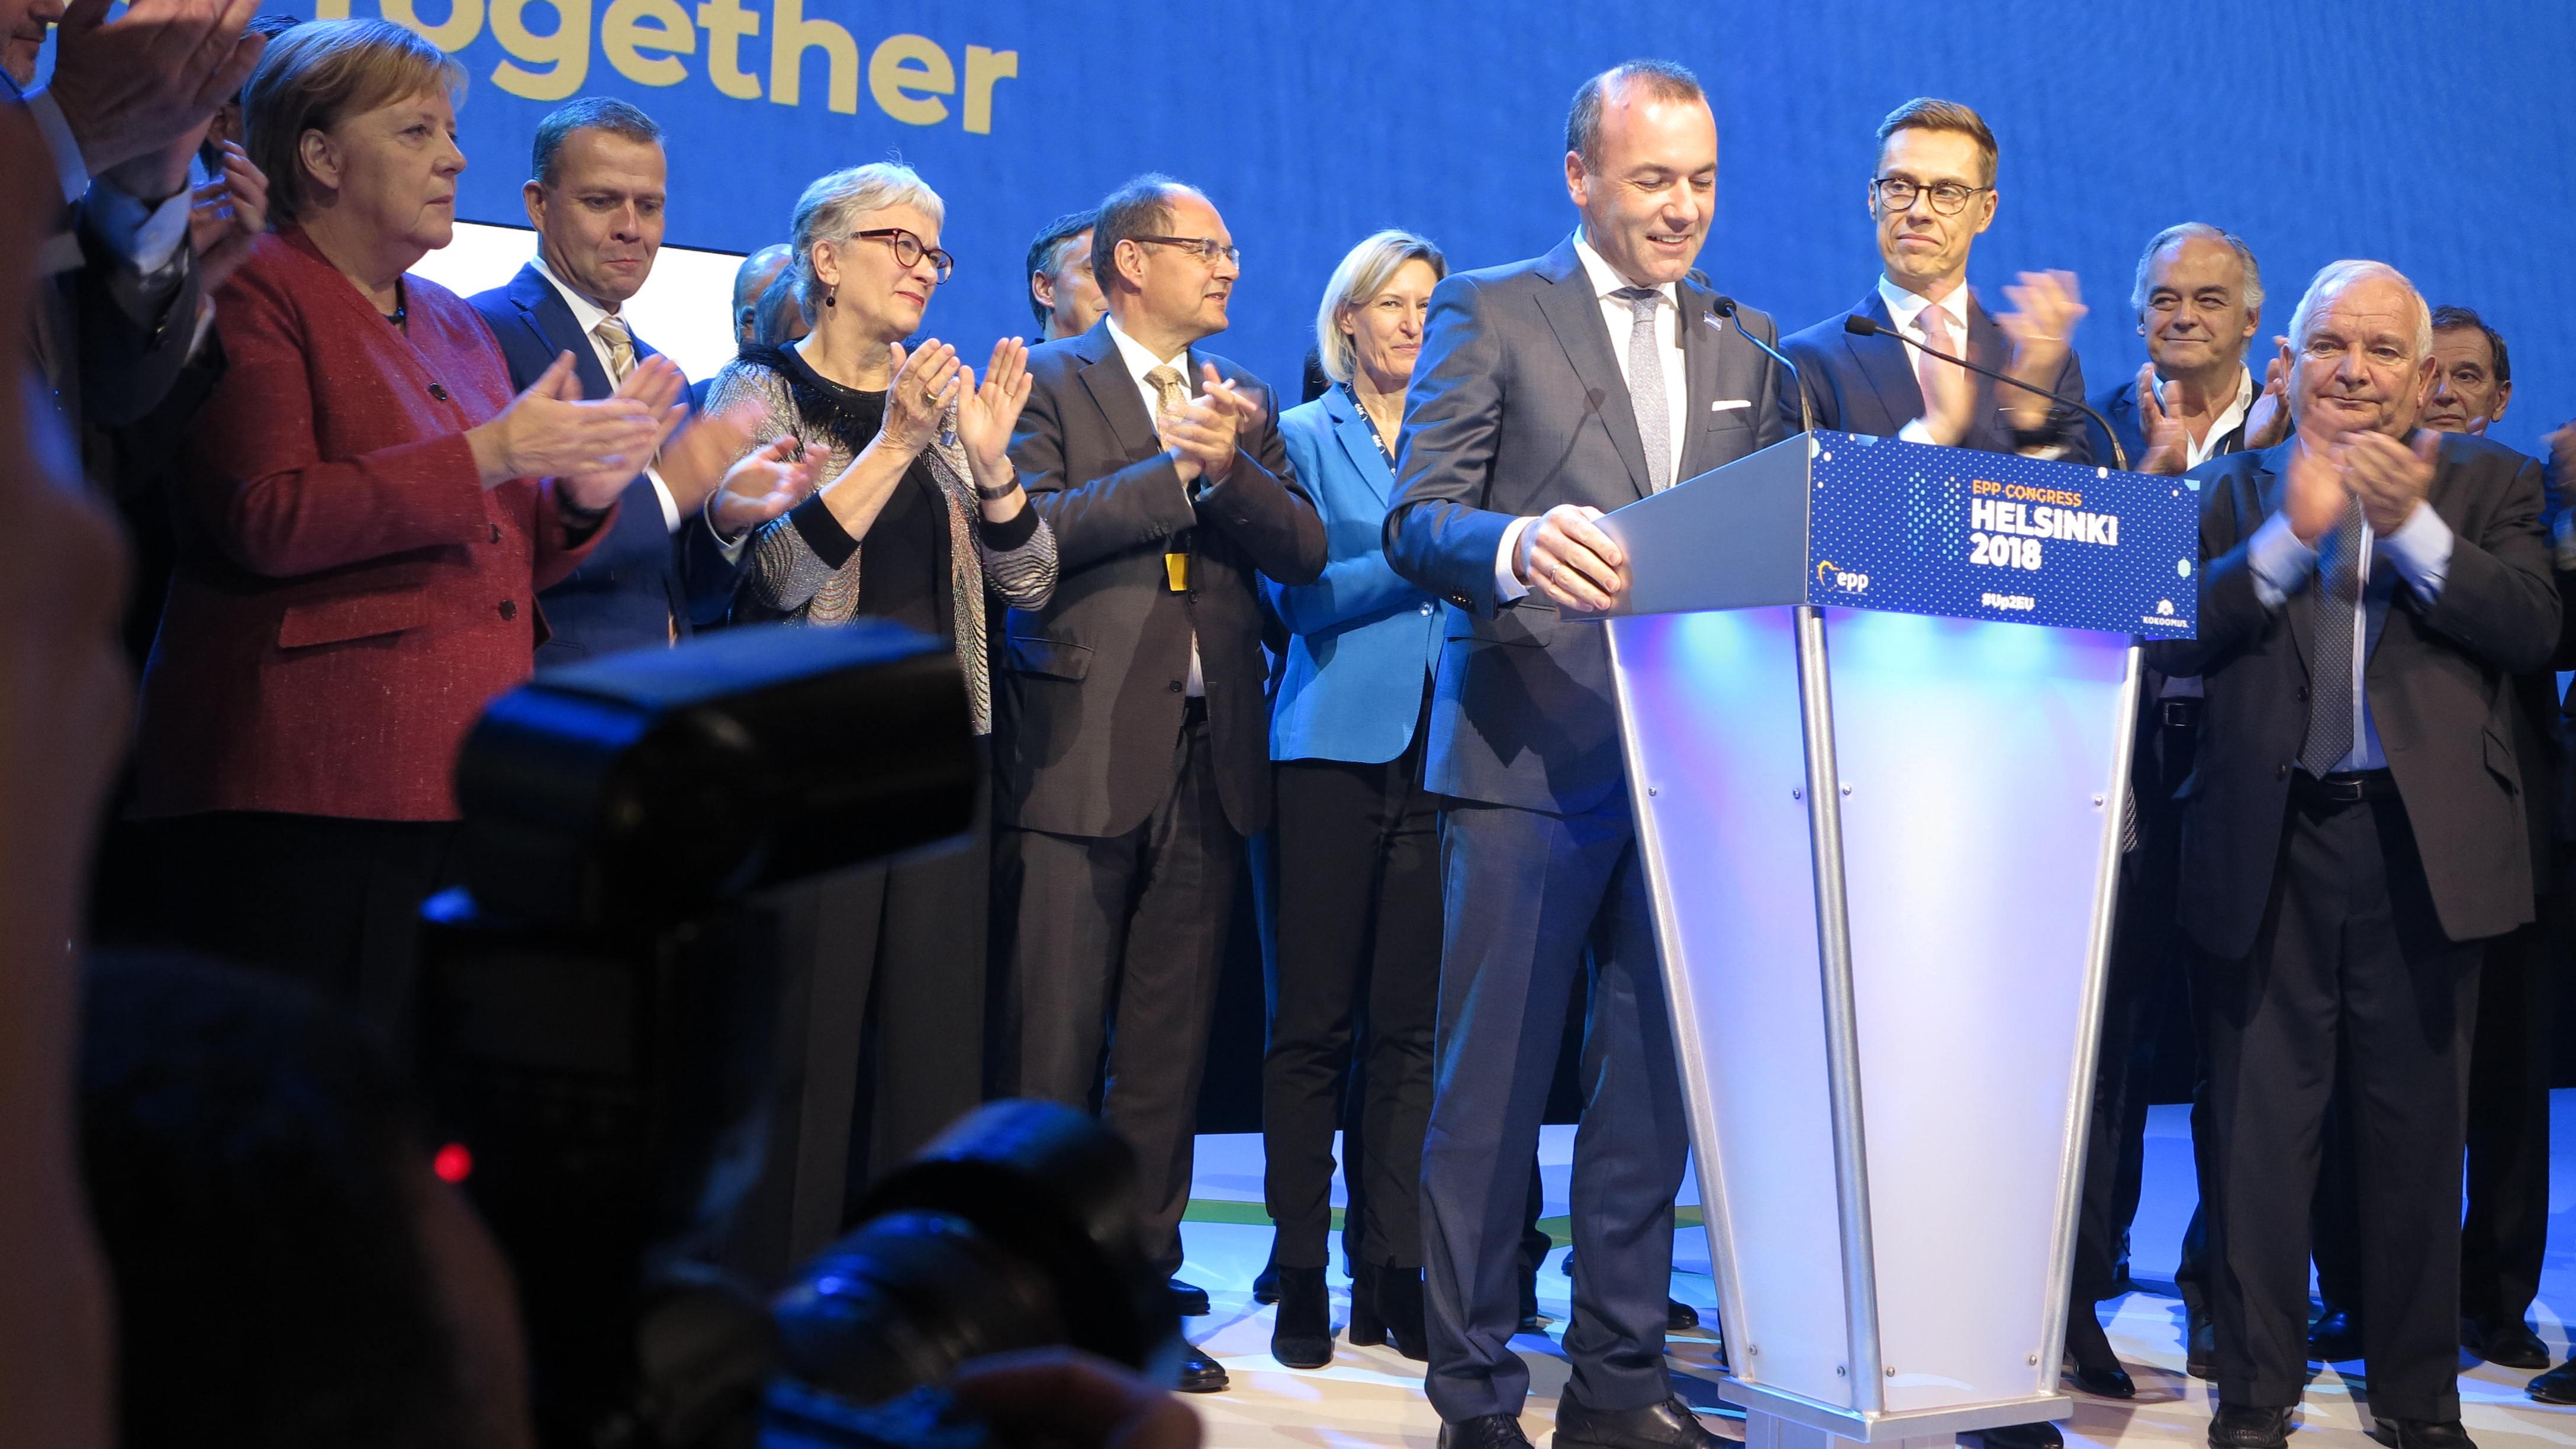 Weber izabran za 'spitzenkandidata' EPP-a